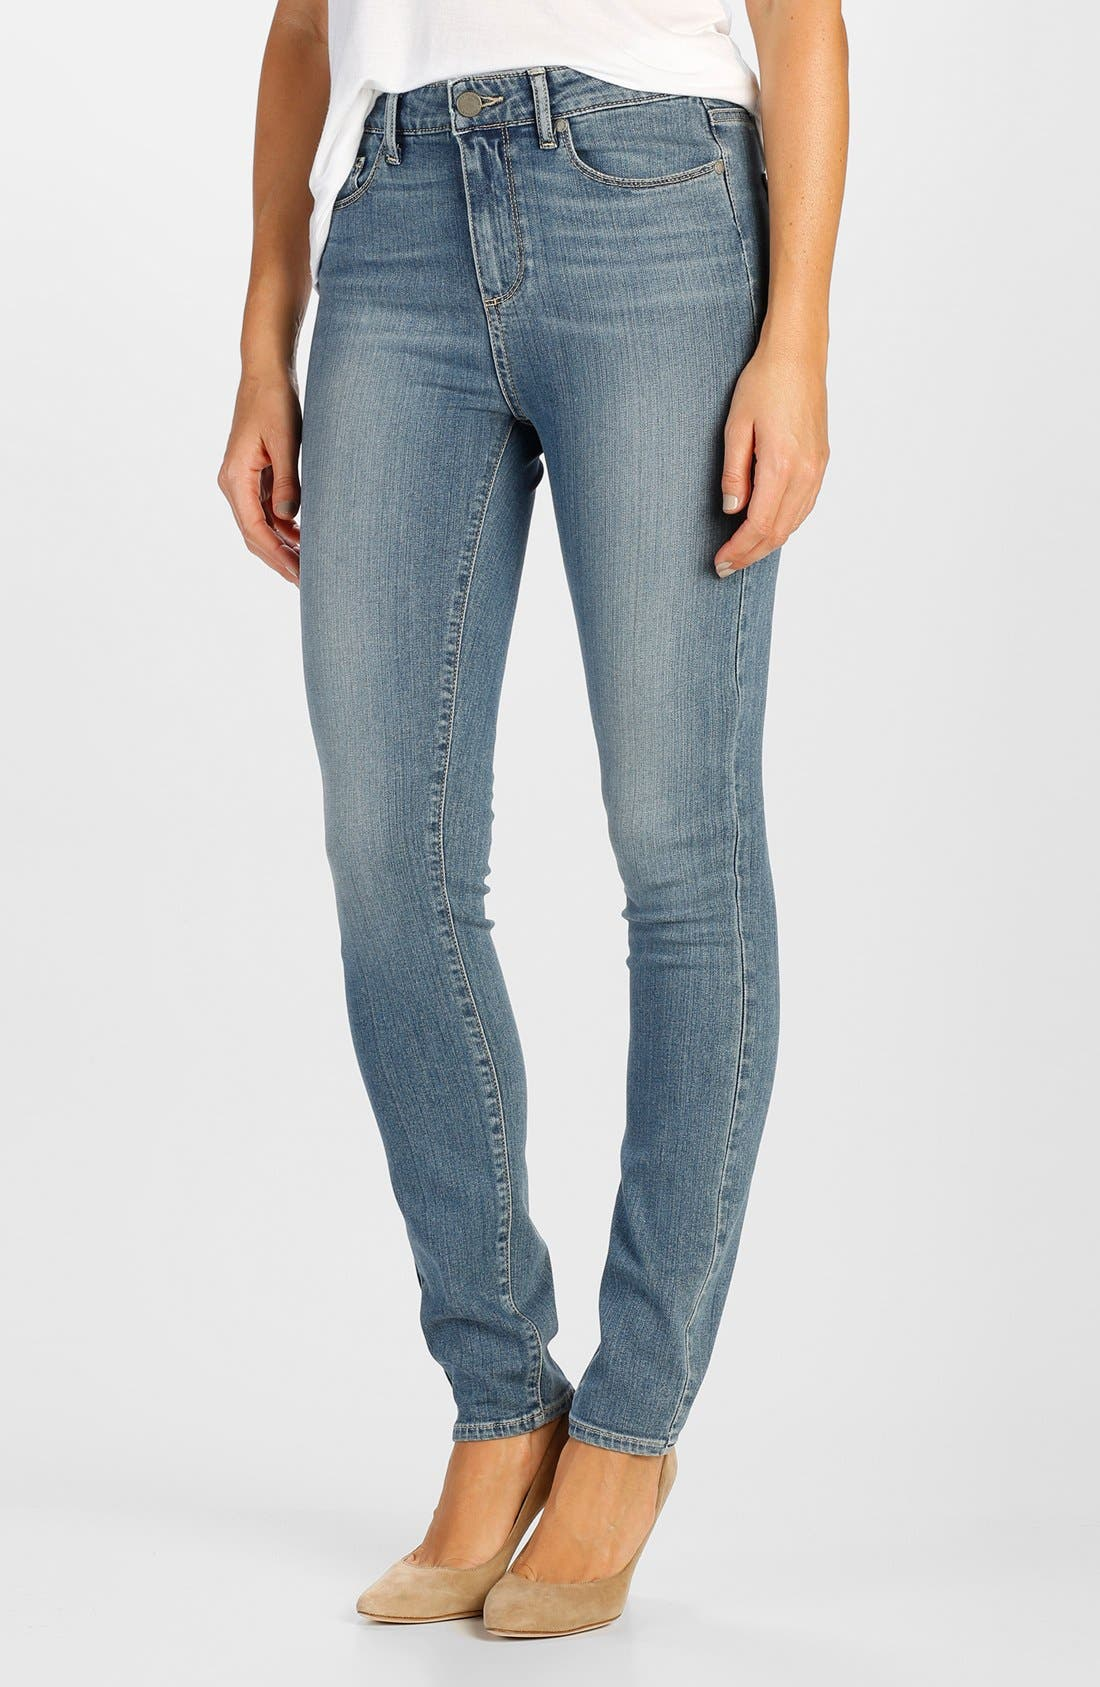 Alternate Image 1 Selected - Paige Denim 'Transcend - Hoxton' High Rise Ultra Skinny Jeans (Teagan)